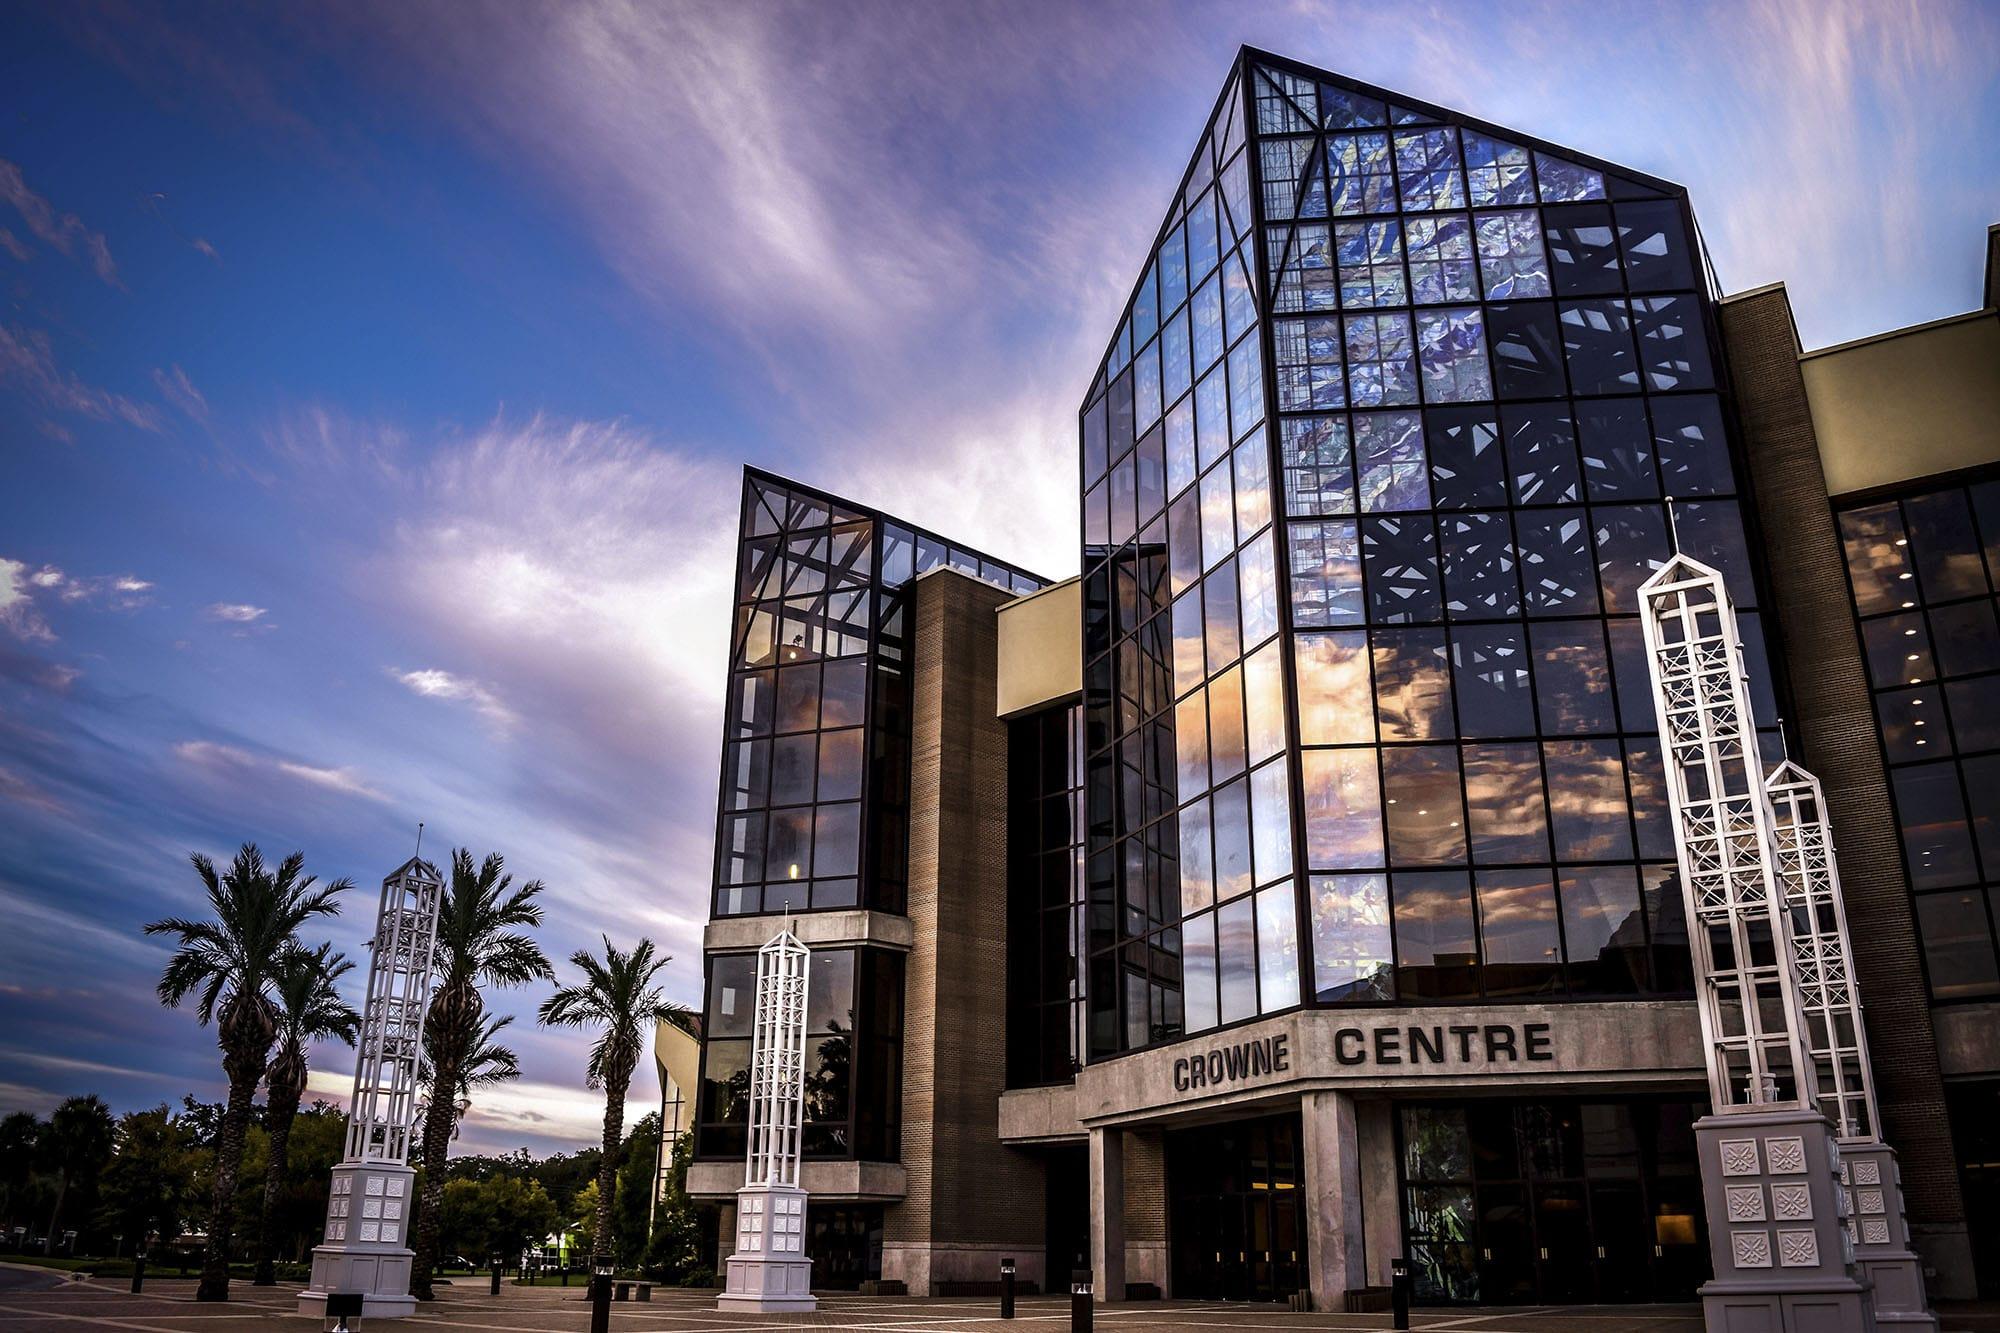 Crowne Centre